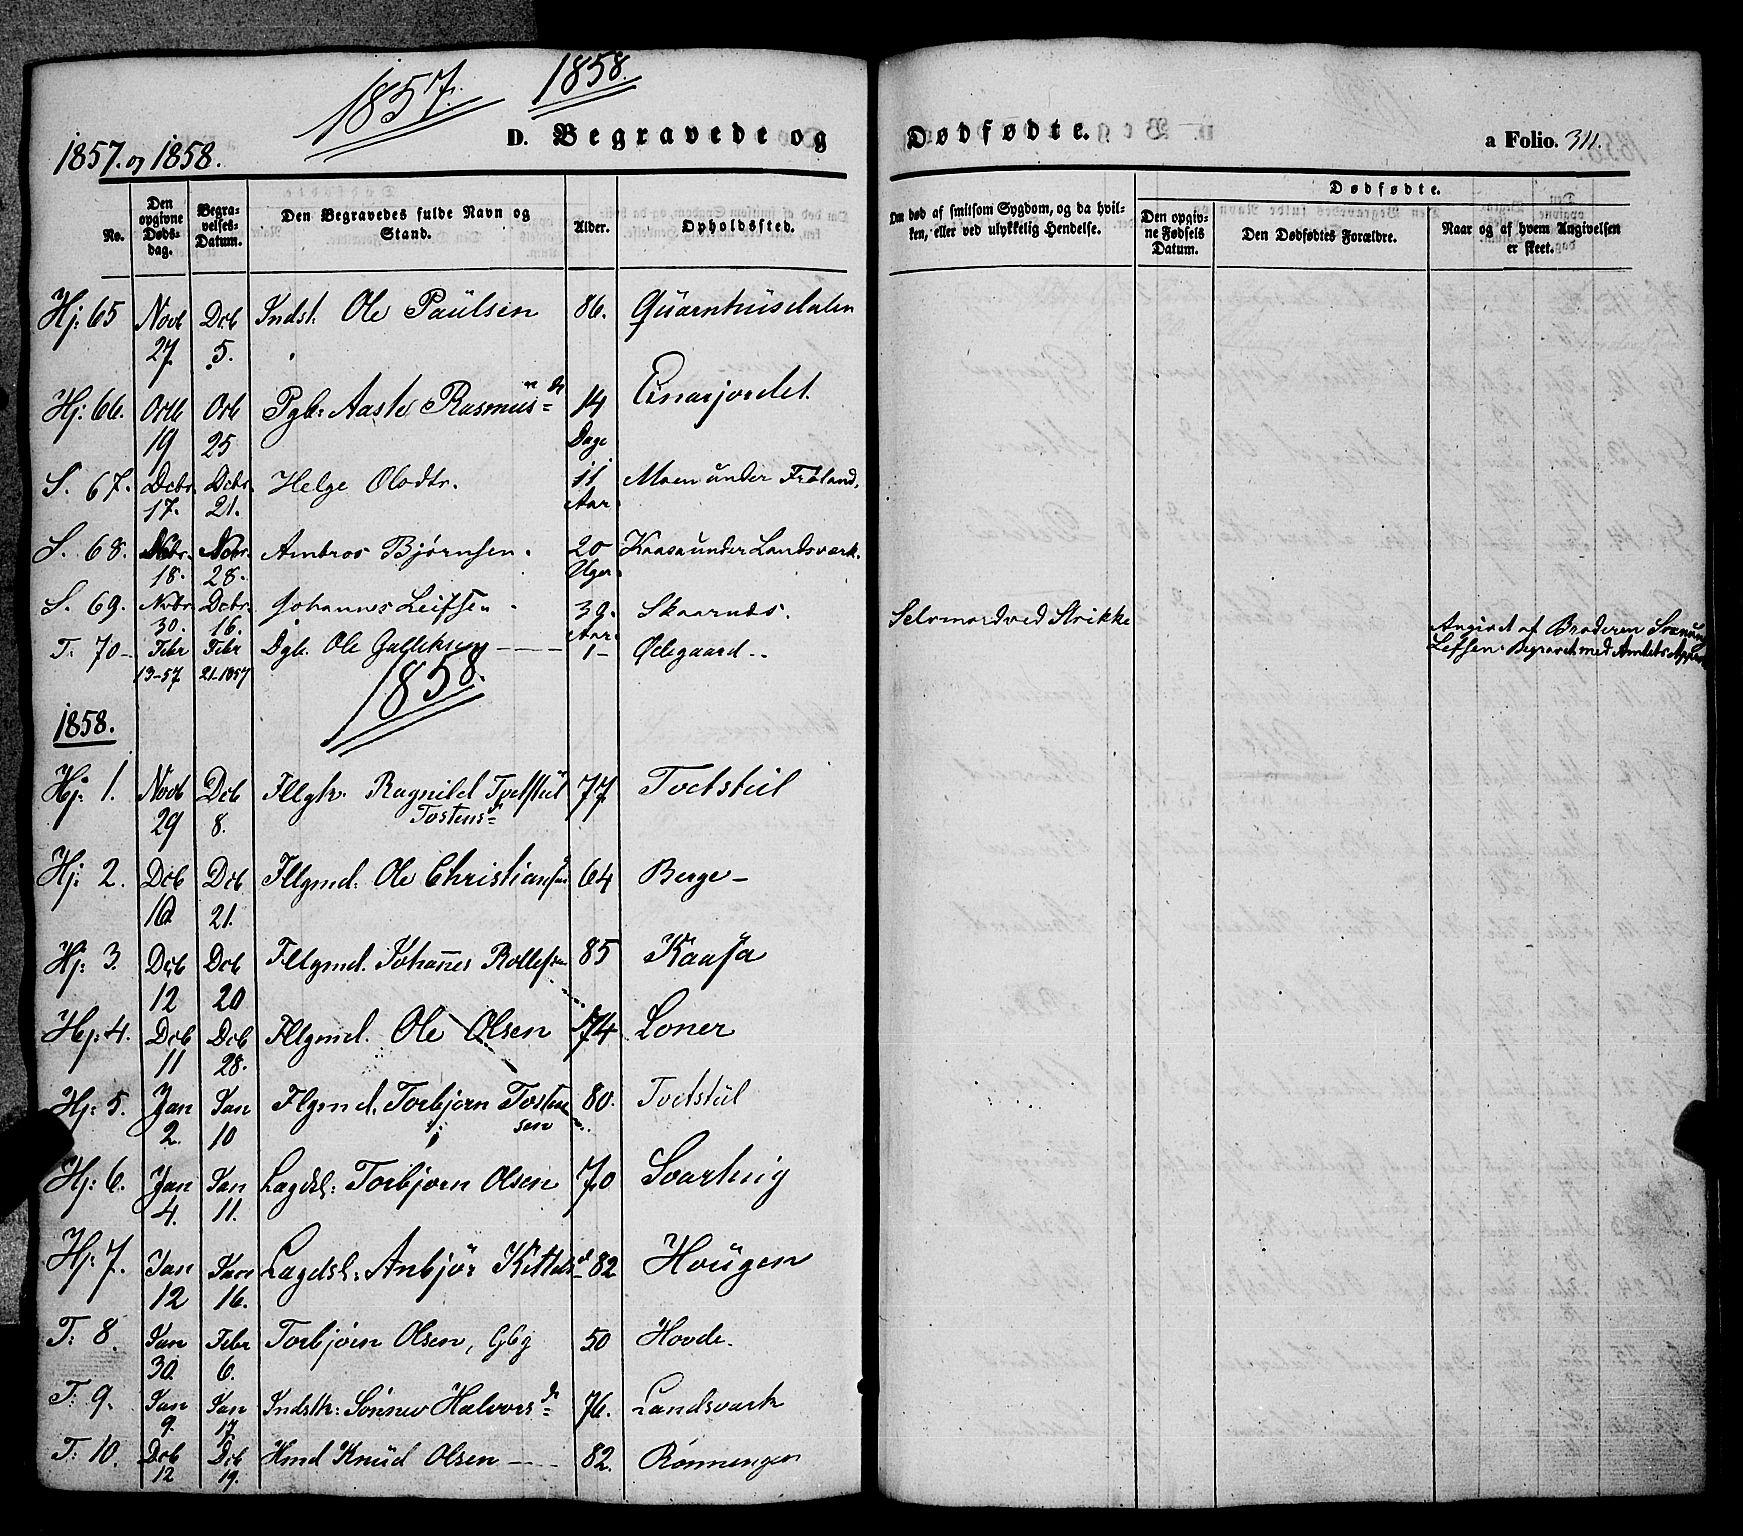 SAKO, Hjartdal kirkebøker, F/Fa/L0008: Ministerialbok nr. I 8, 1844-1859, s. 311